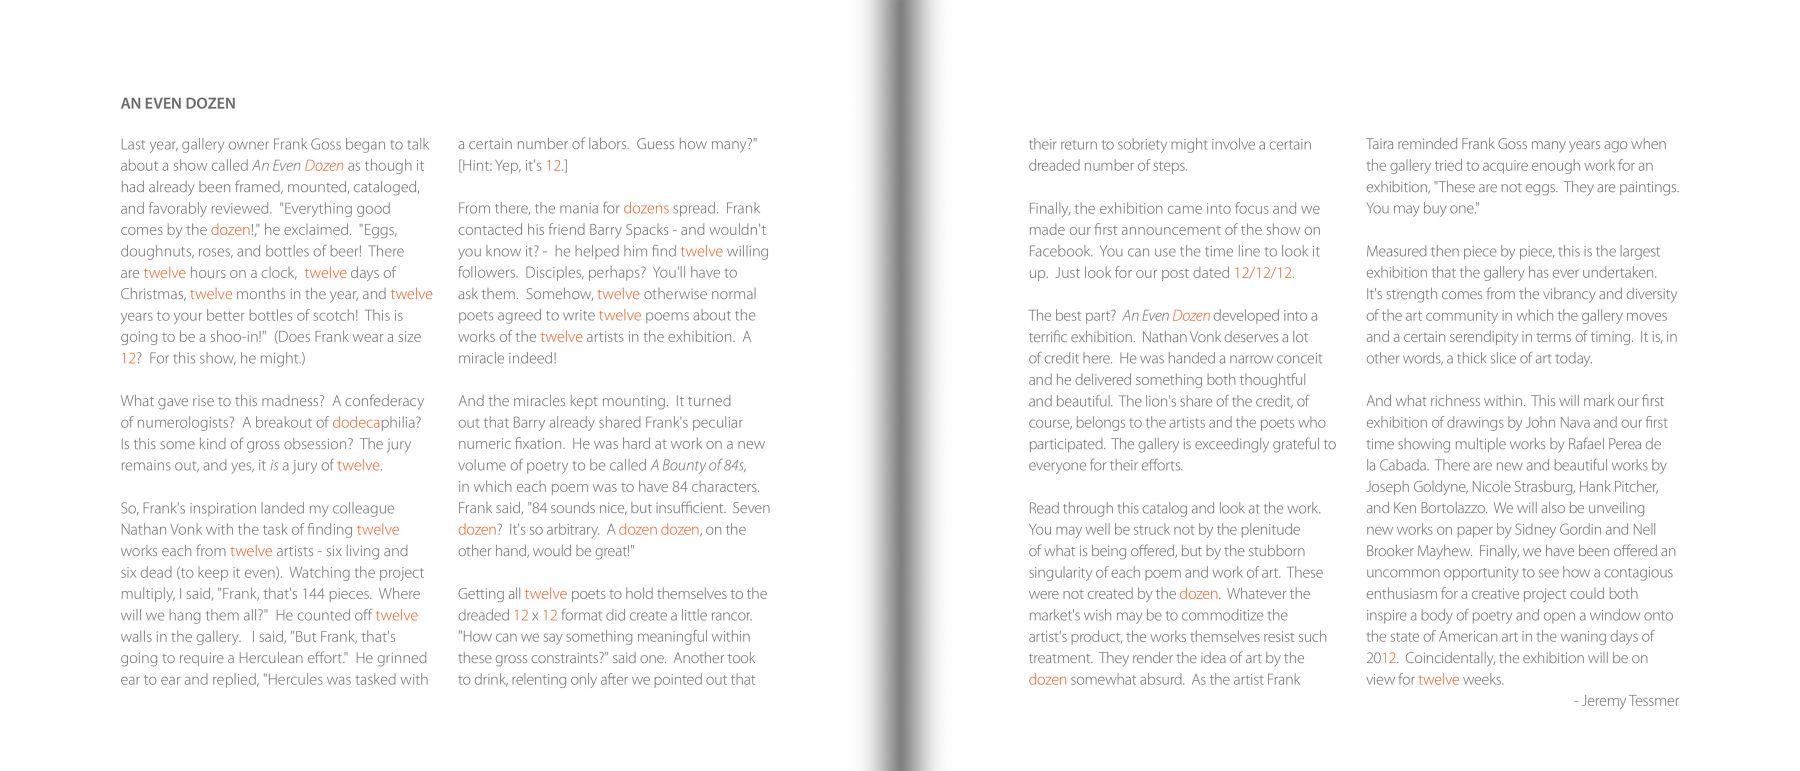 An Even Dozen detail pages